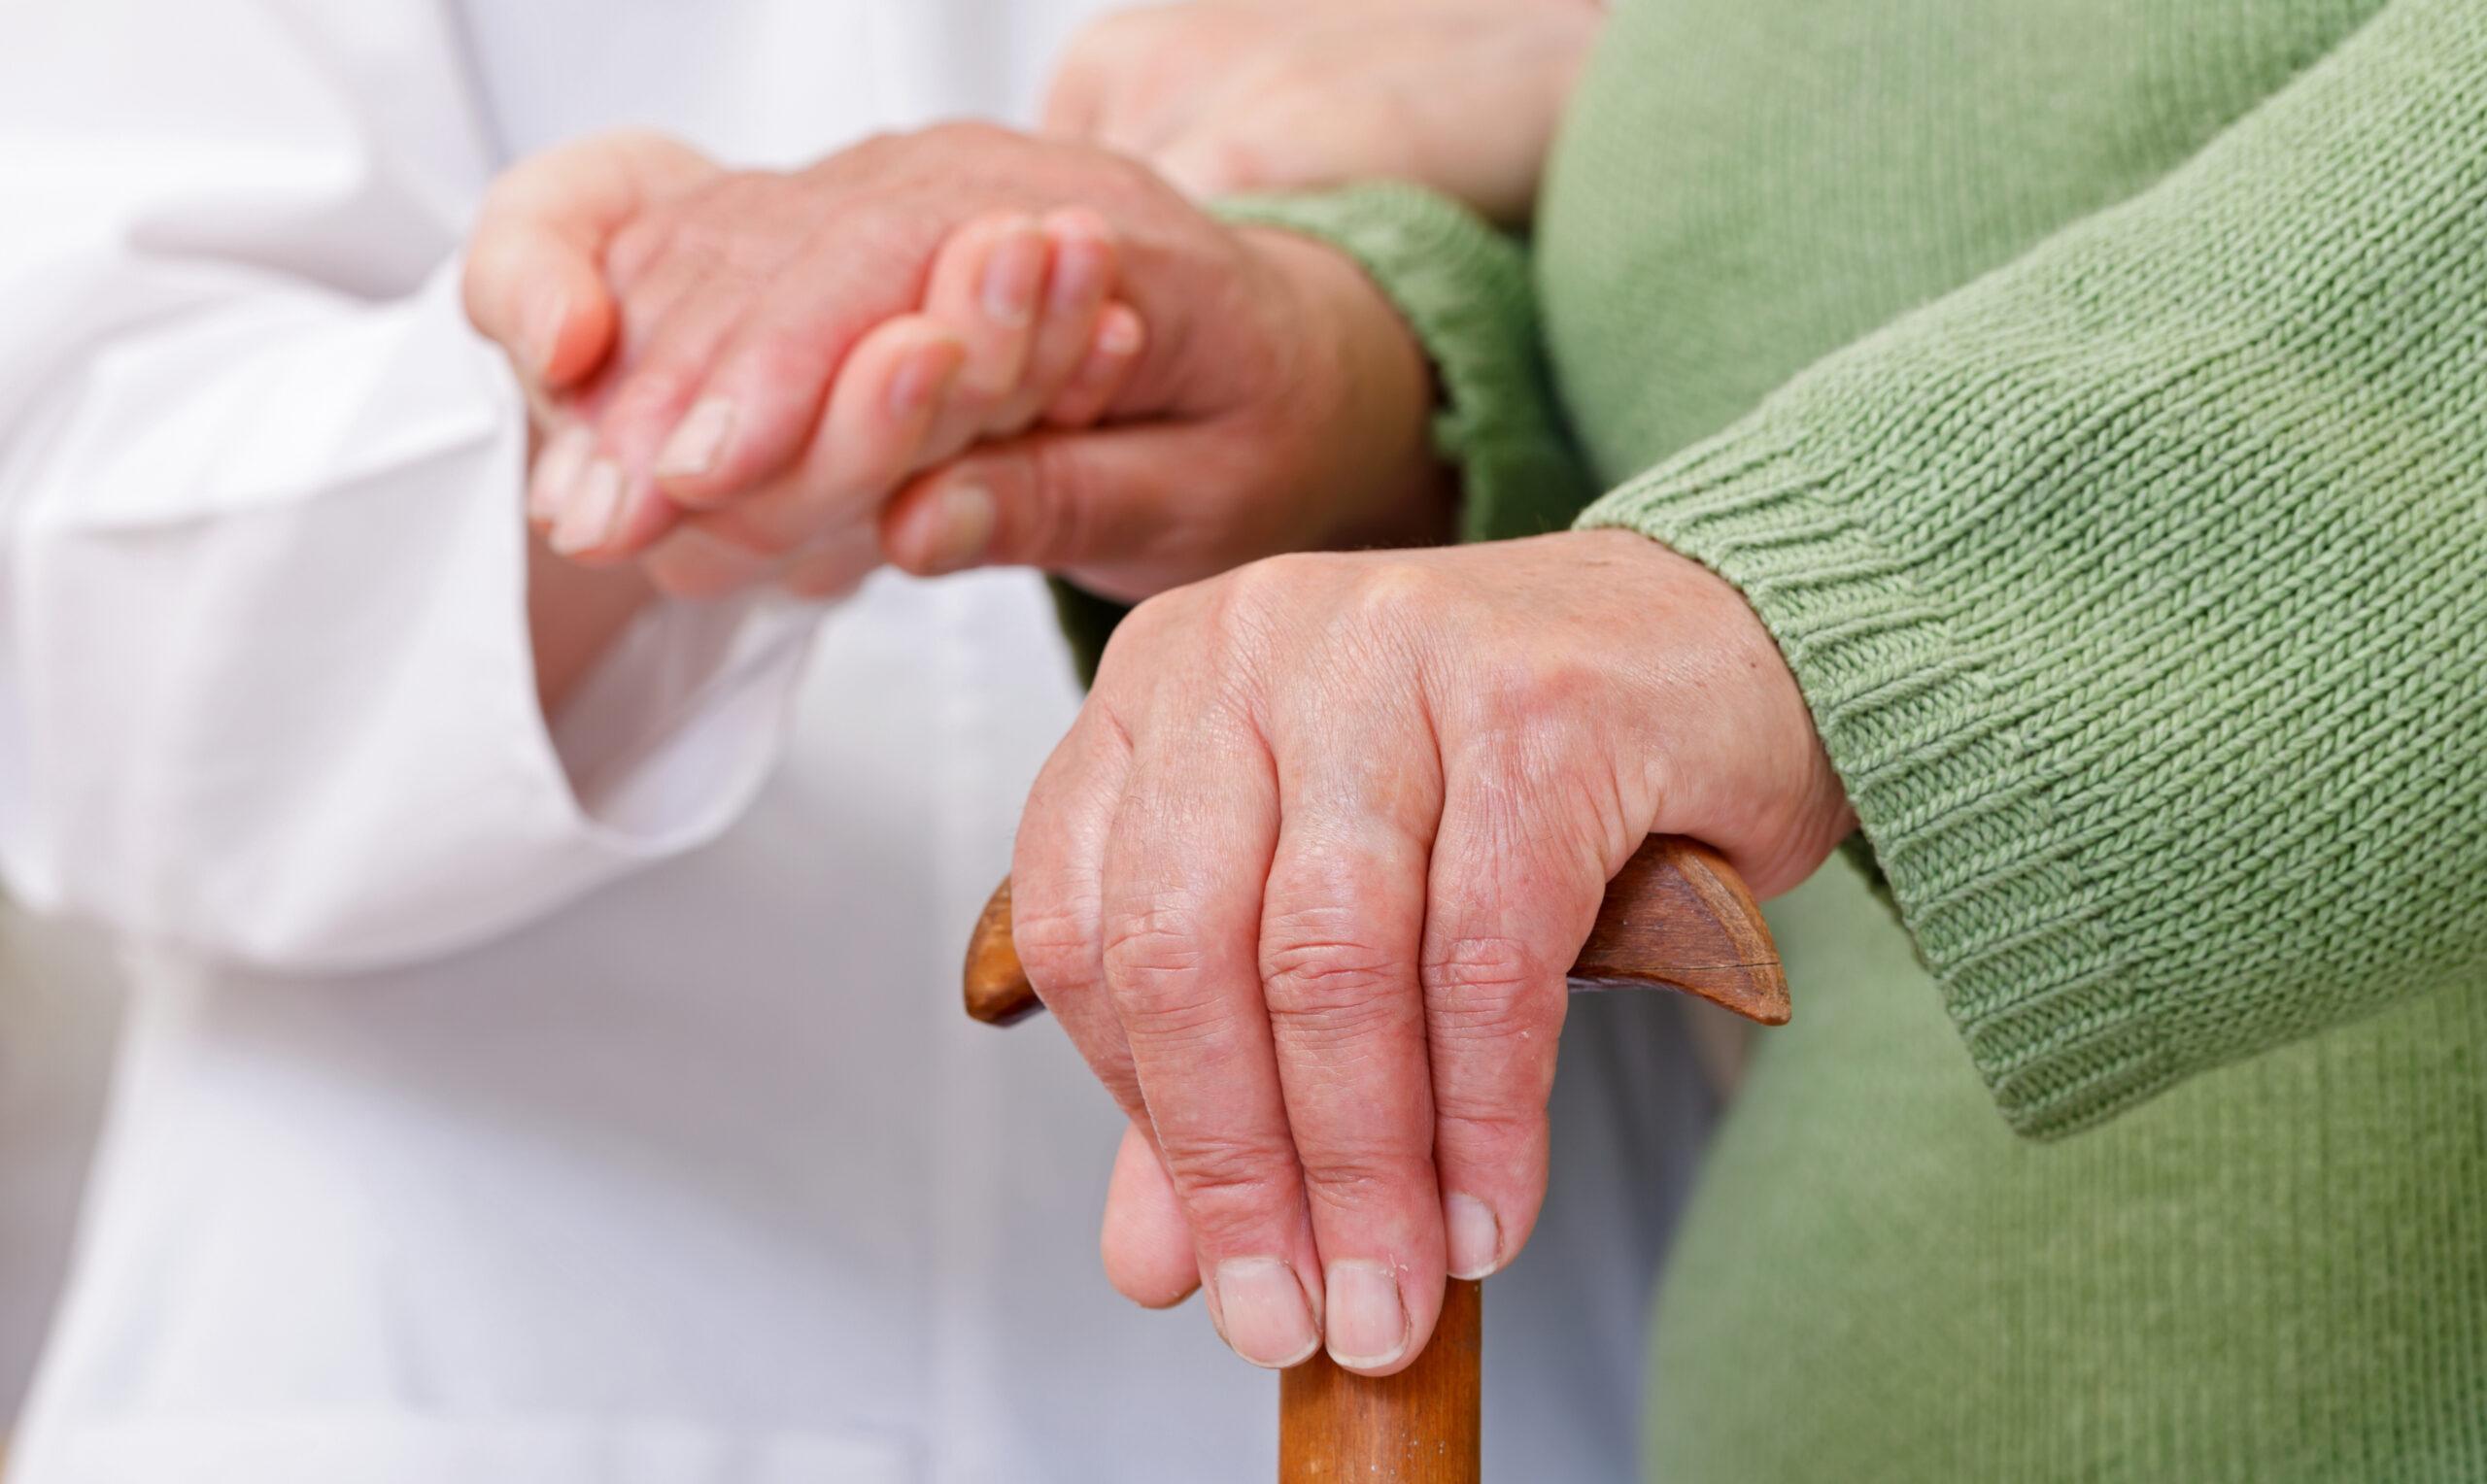 hands of nursing assistant and elderly resident